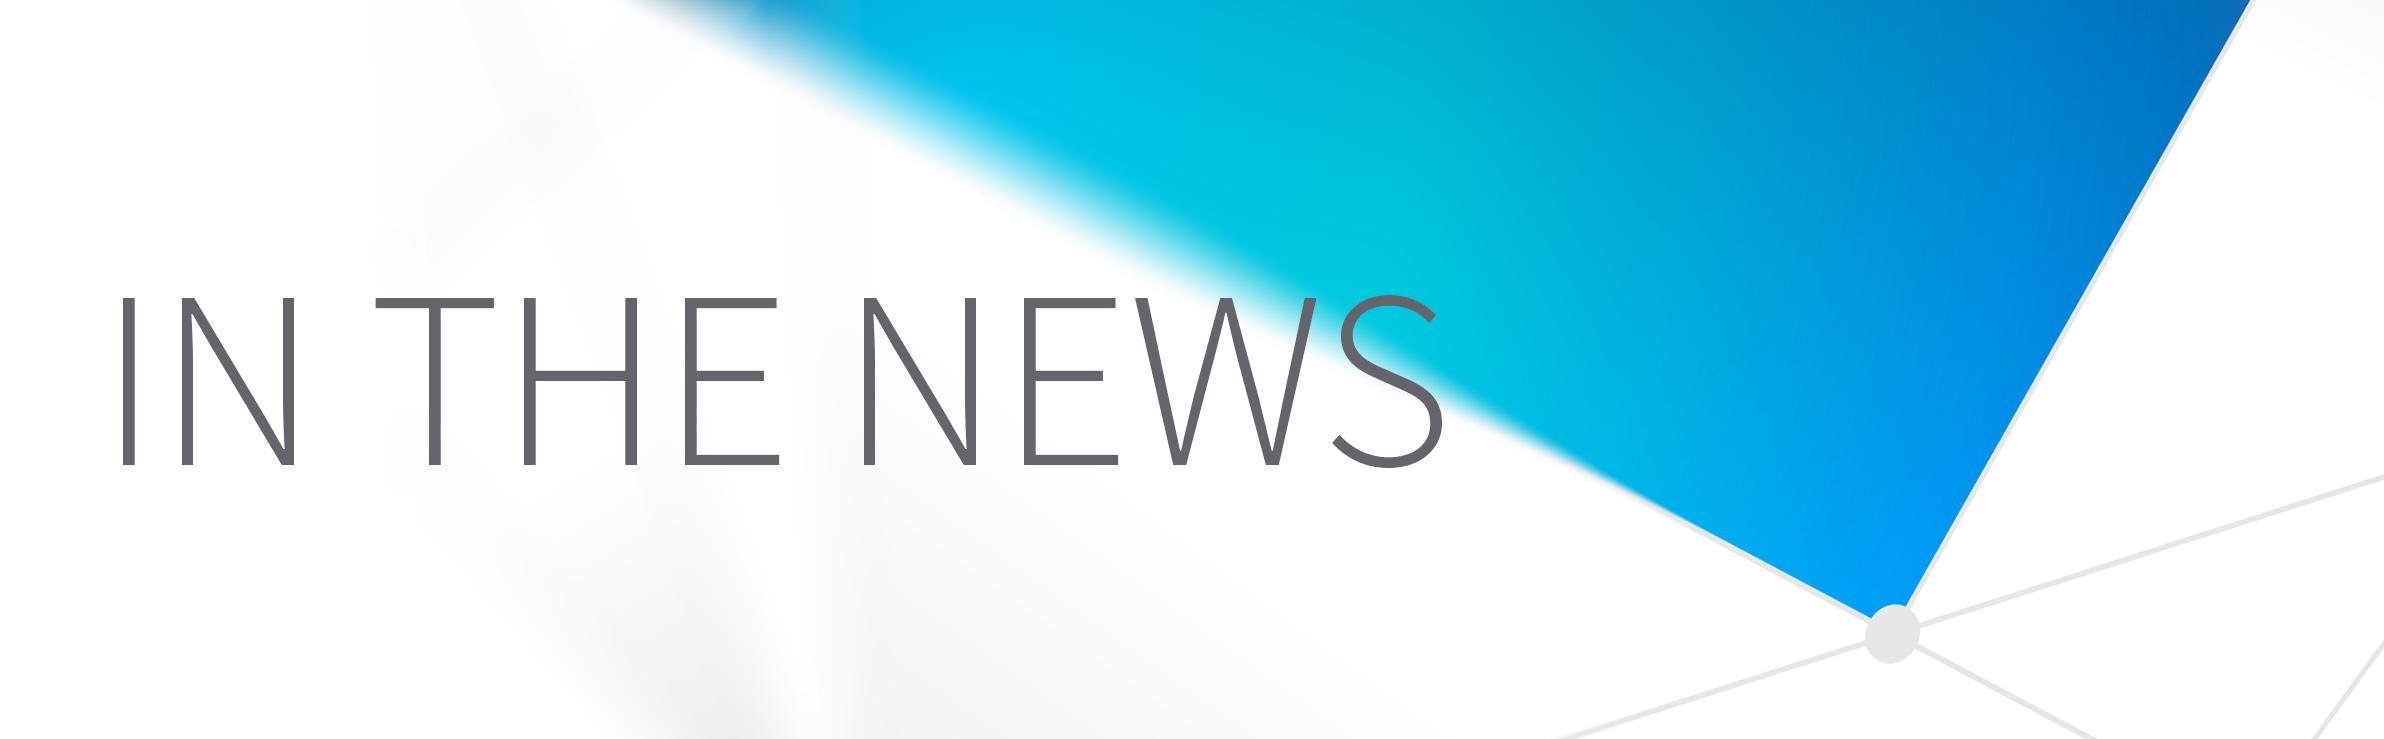 In The News  >> In The News Advantech B B Smartworx